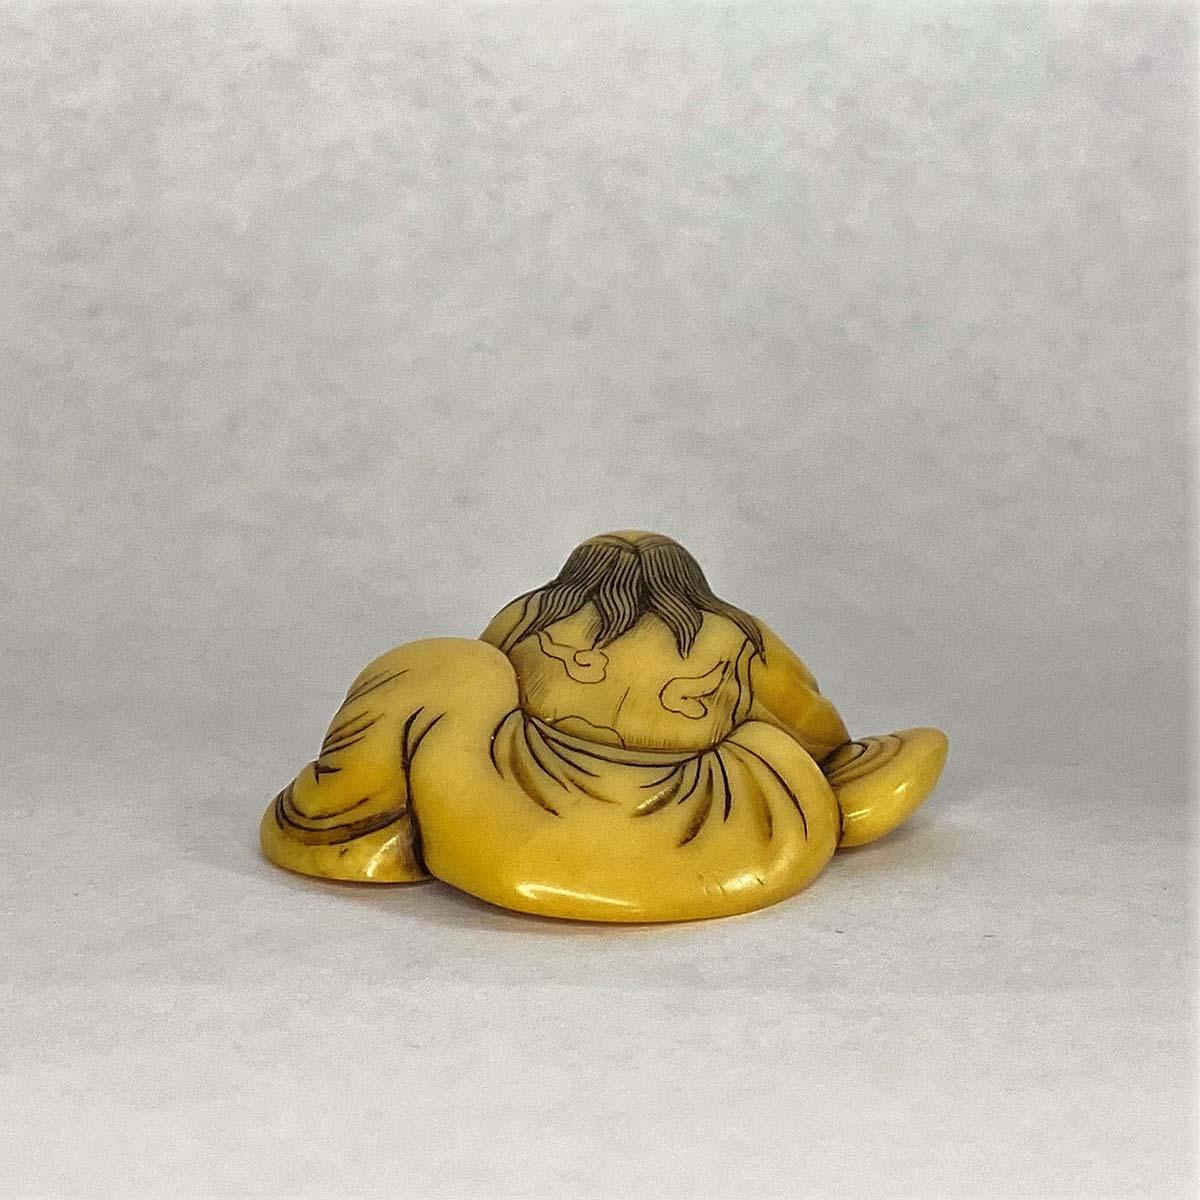 Crouching Figure 4